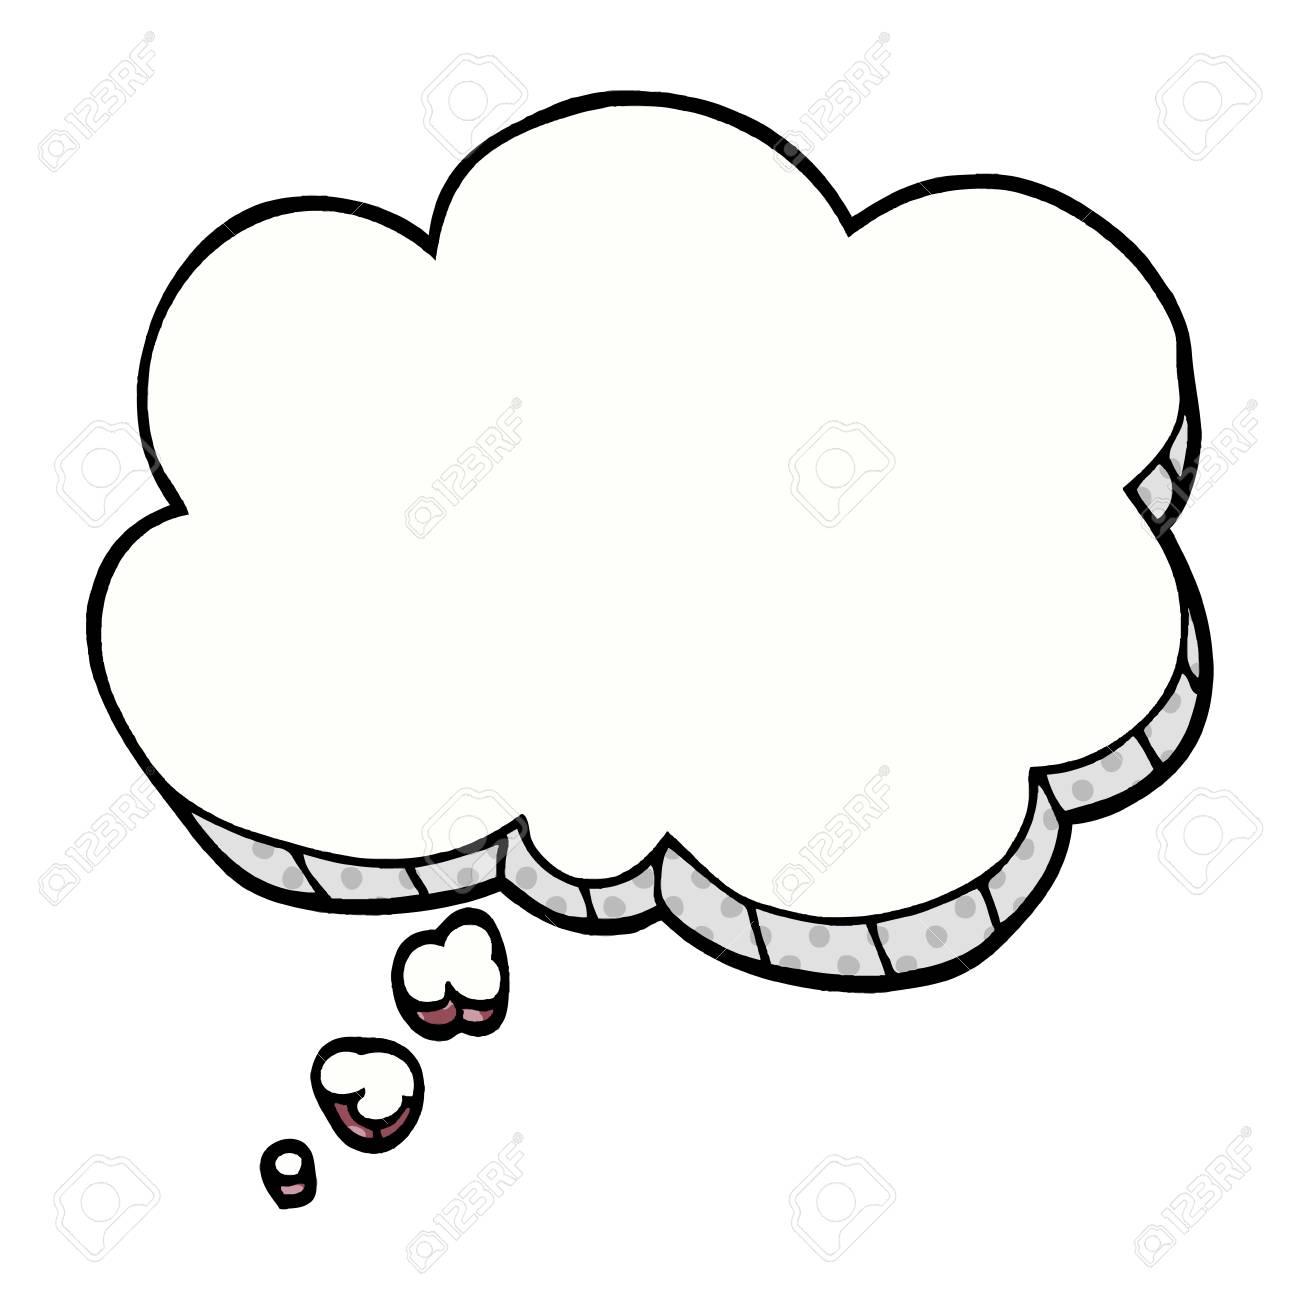 cartoon doodle expression bubble - 110504816